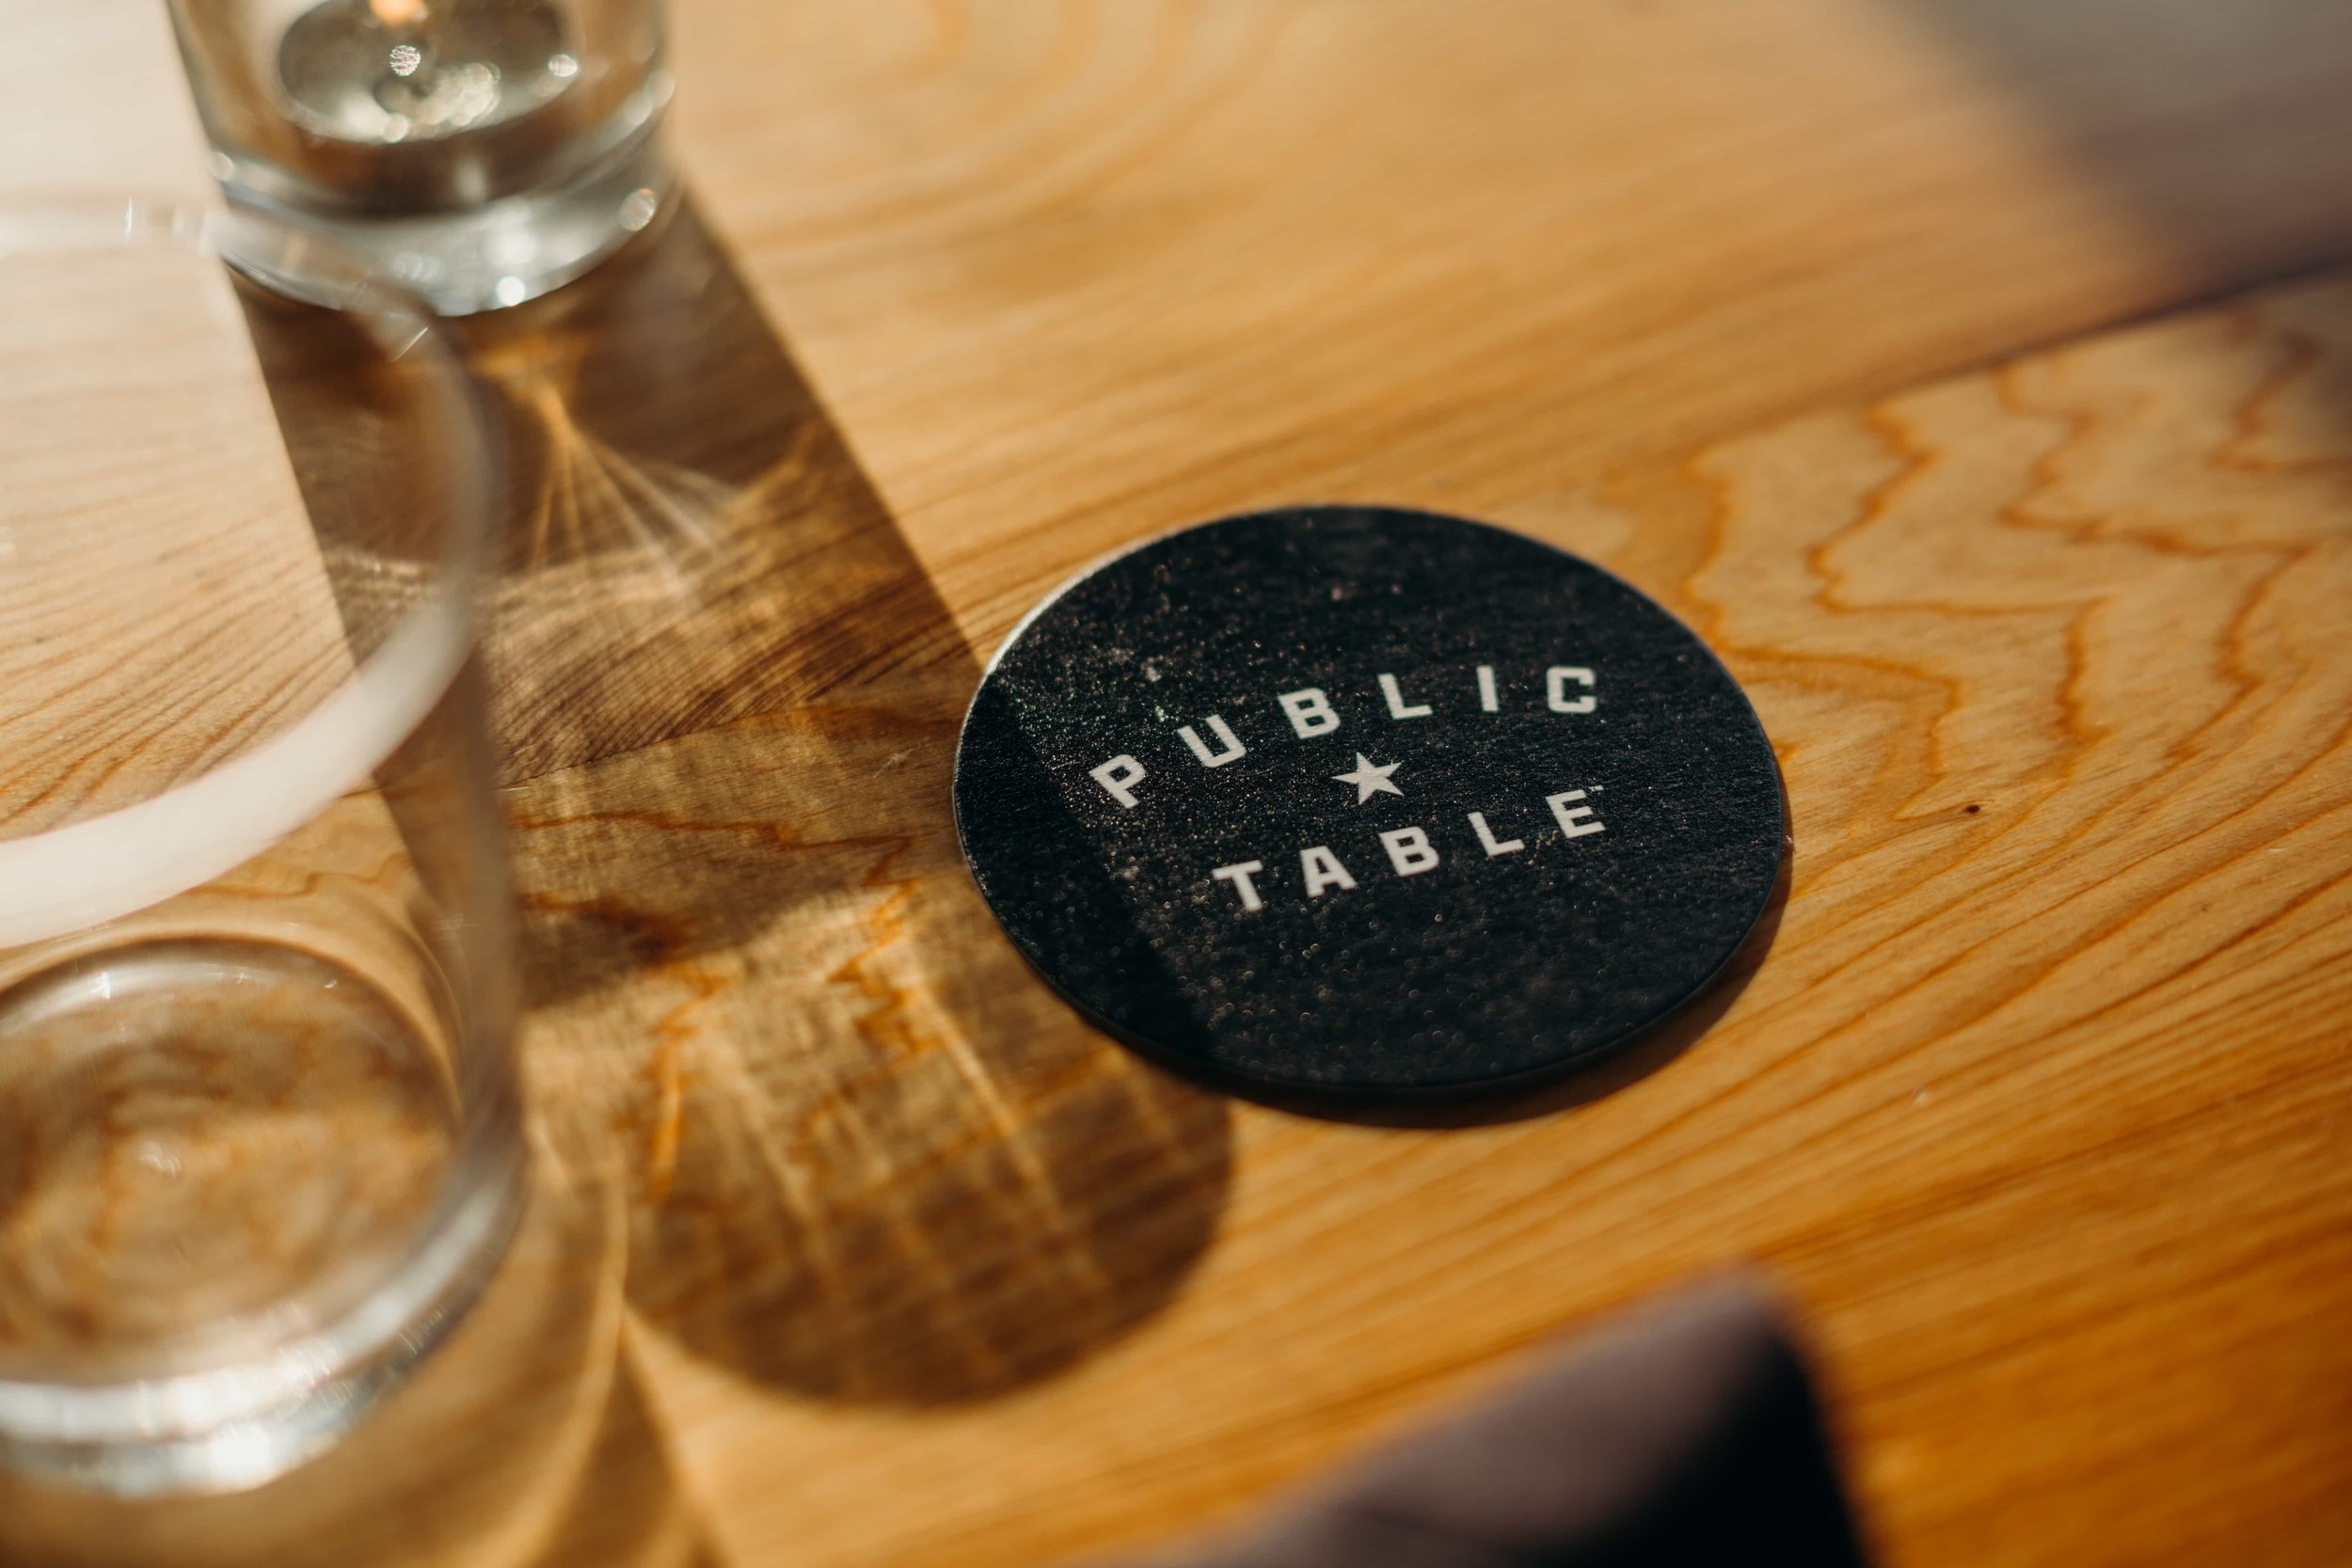 PublicTable-3.jpg